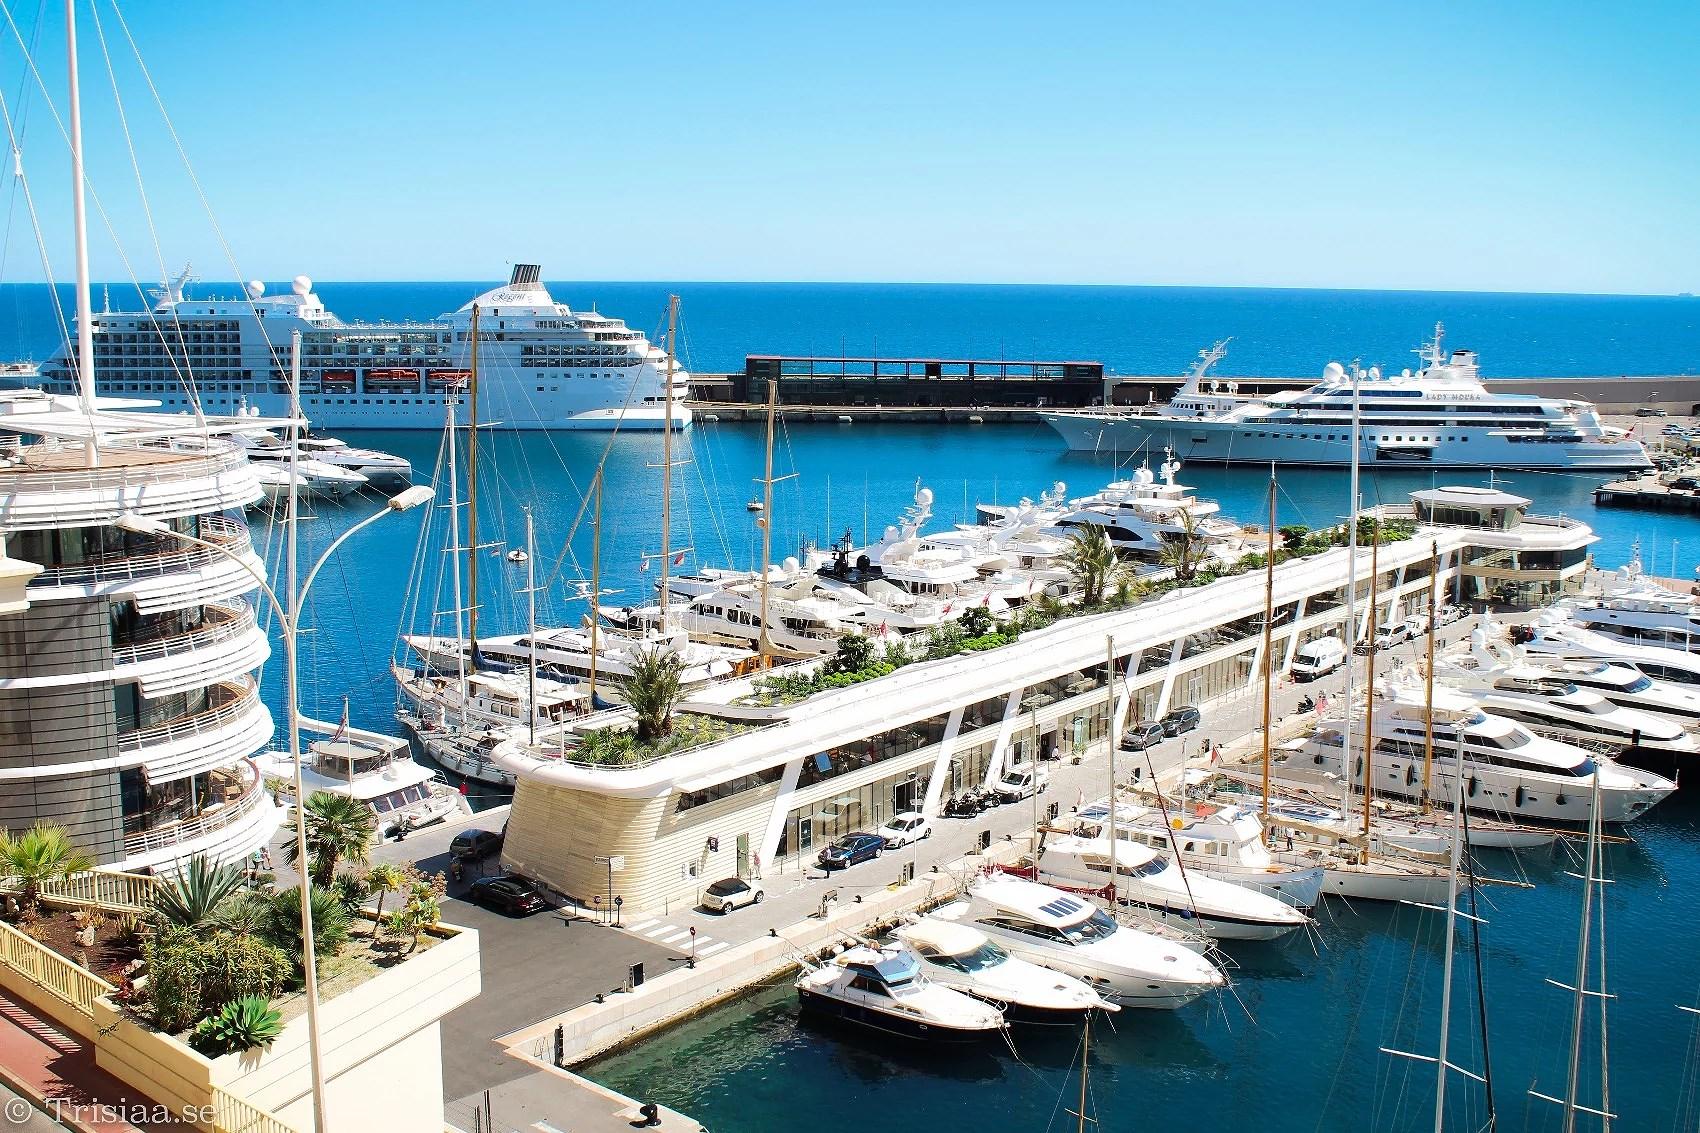 Boats everywhere - Monaco